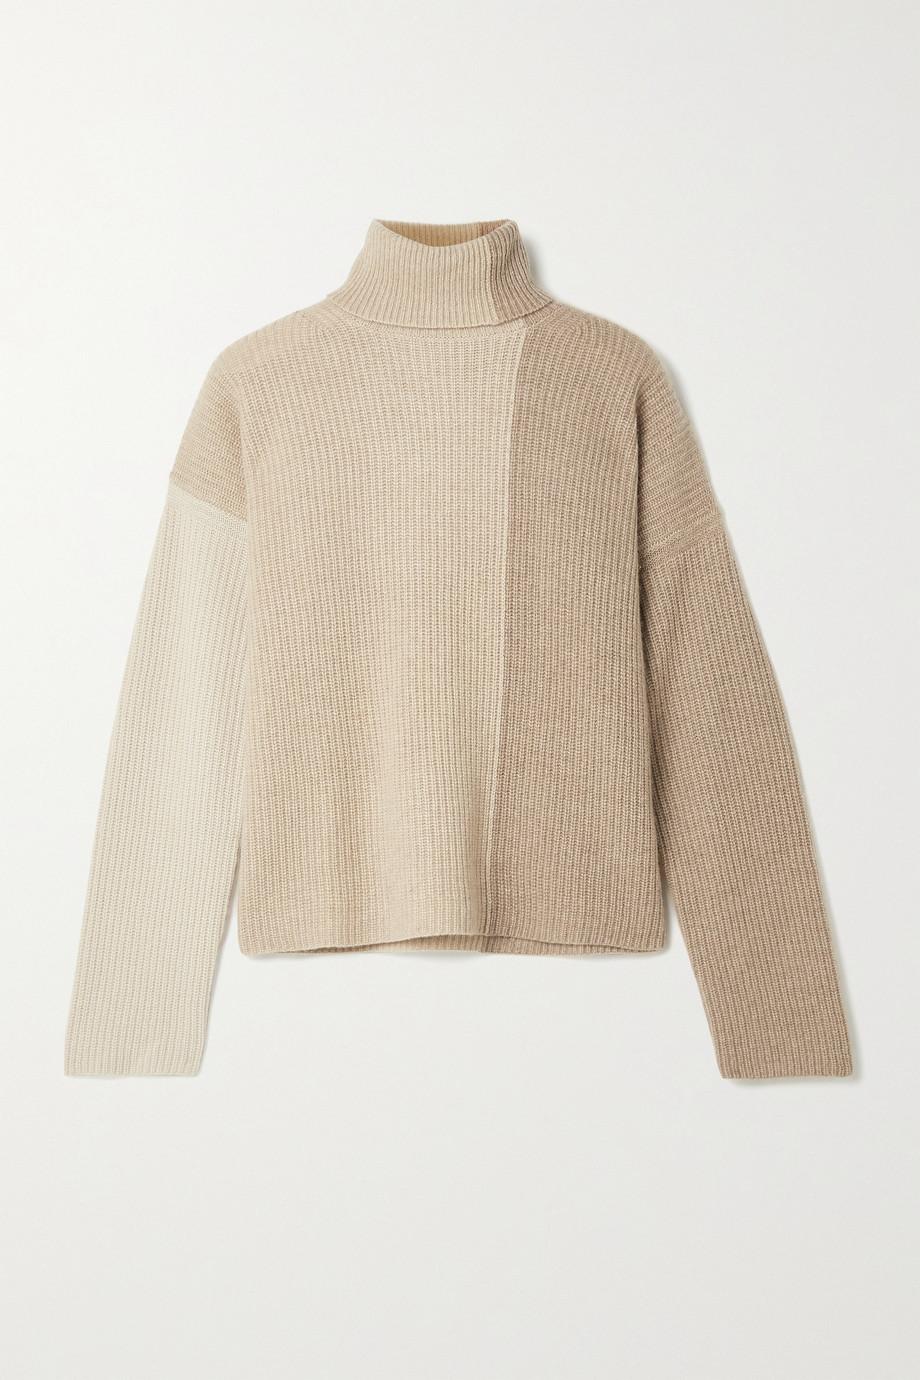 La Ligne Color-block ribbed cashmere turtleneck sweater